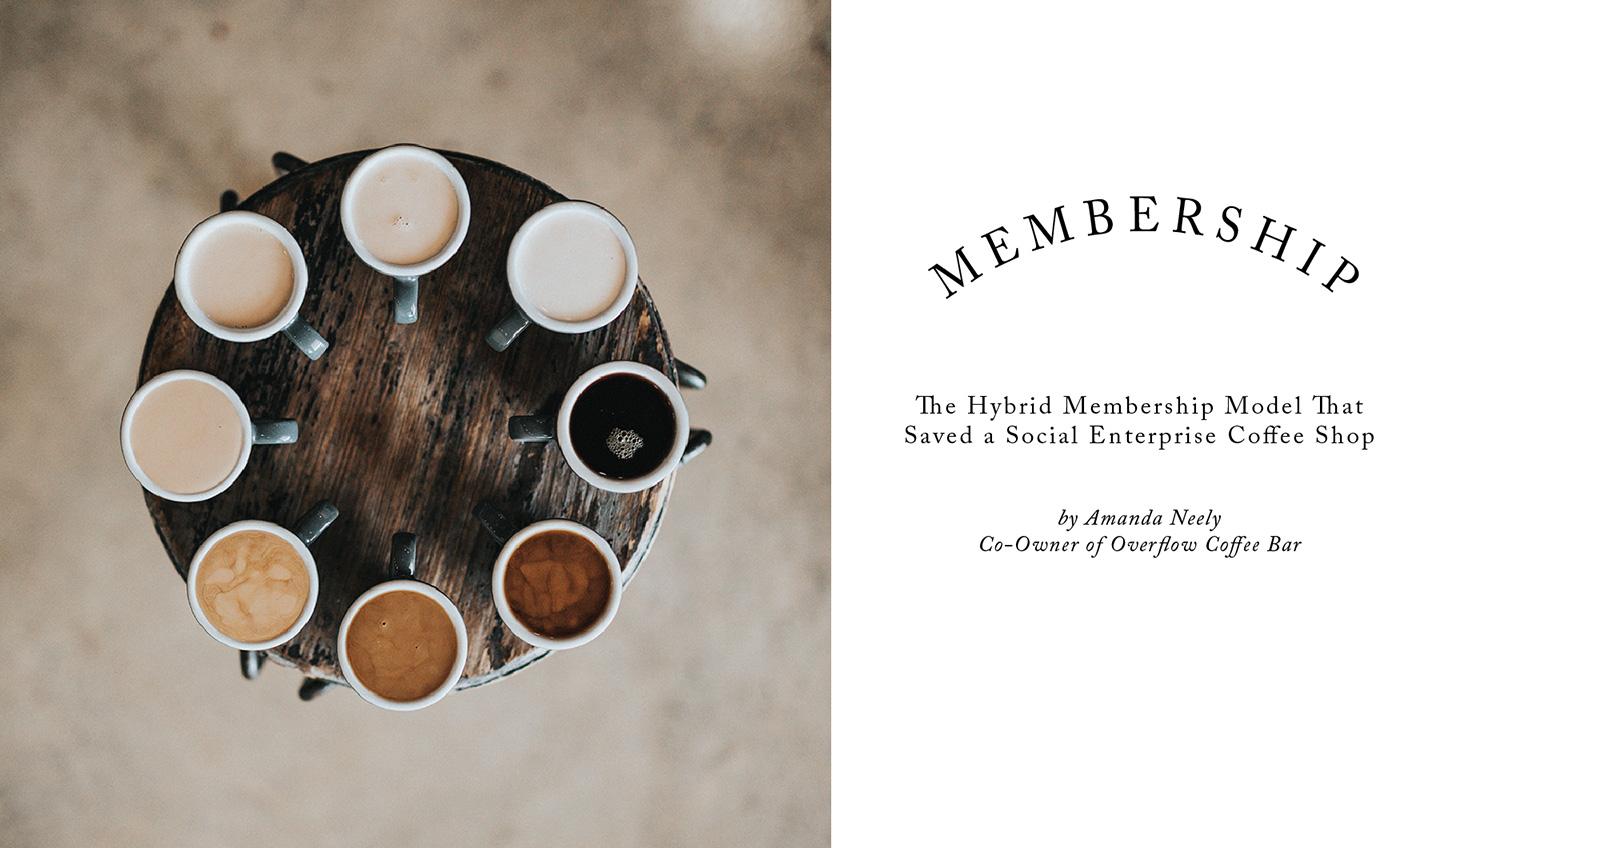 Membership Models for Social Enterprise